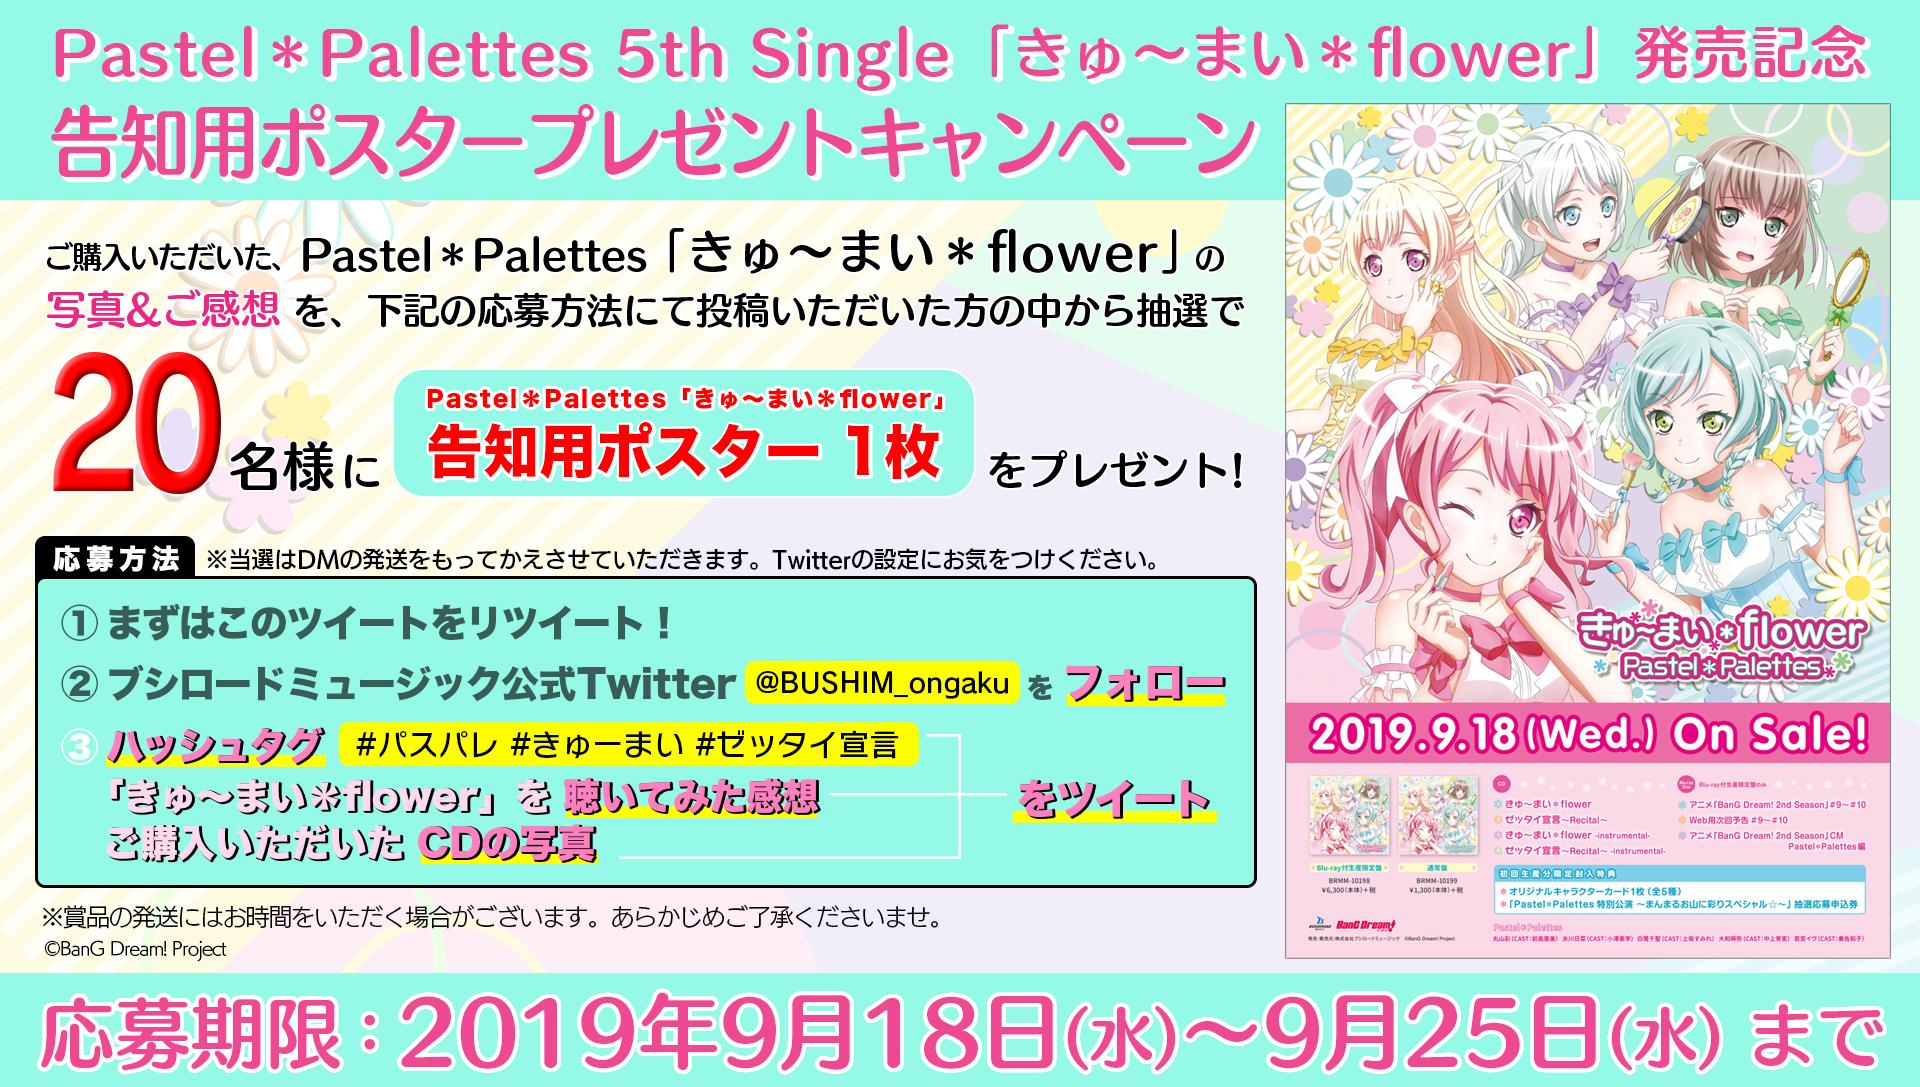 BanG Dream!(バンドリ!) Pastel*Palettes 5th Single「きゅ~まい*flower」発売記念 告知用ポスタープレゼントキャンペーン開催